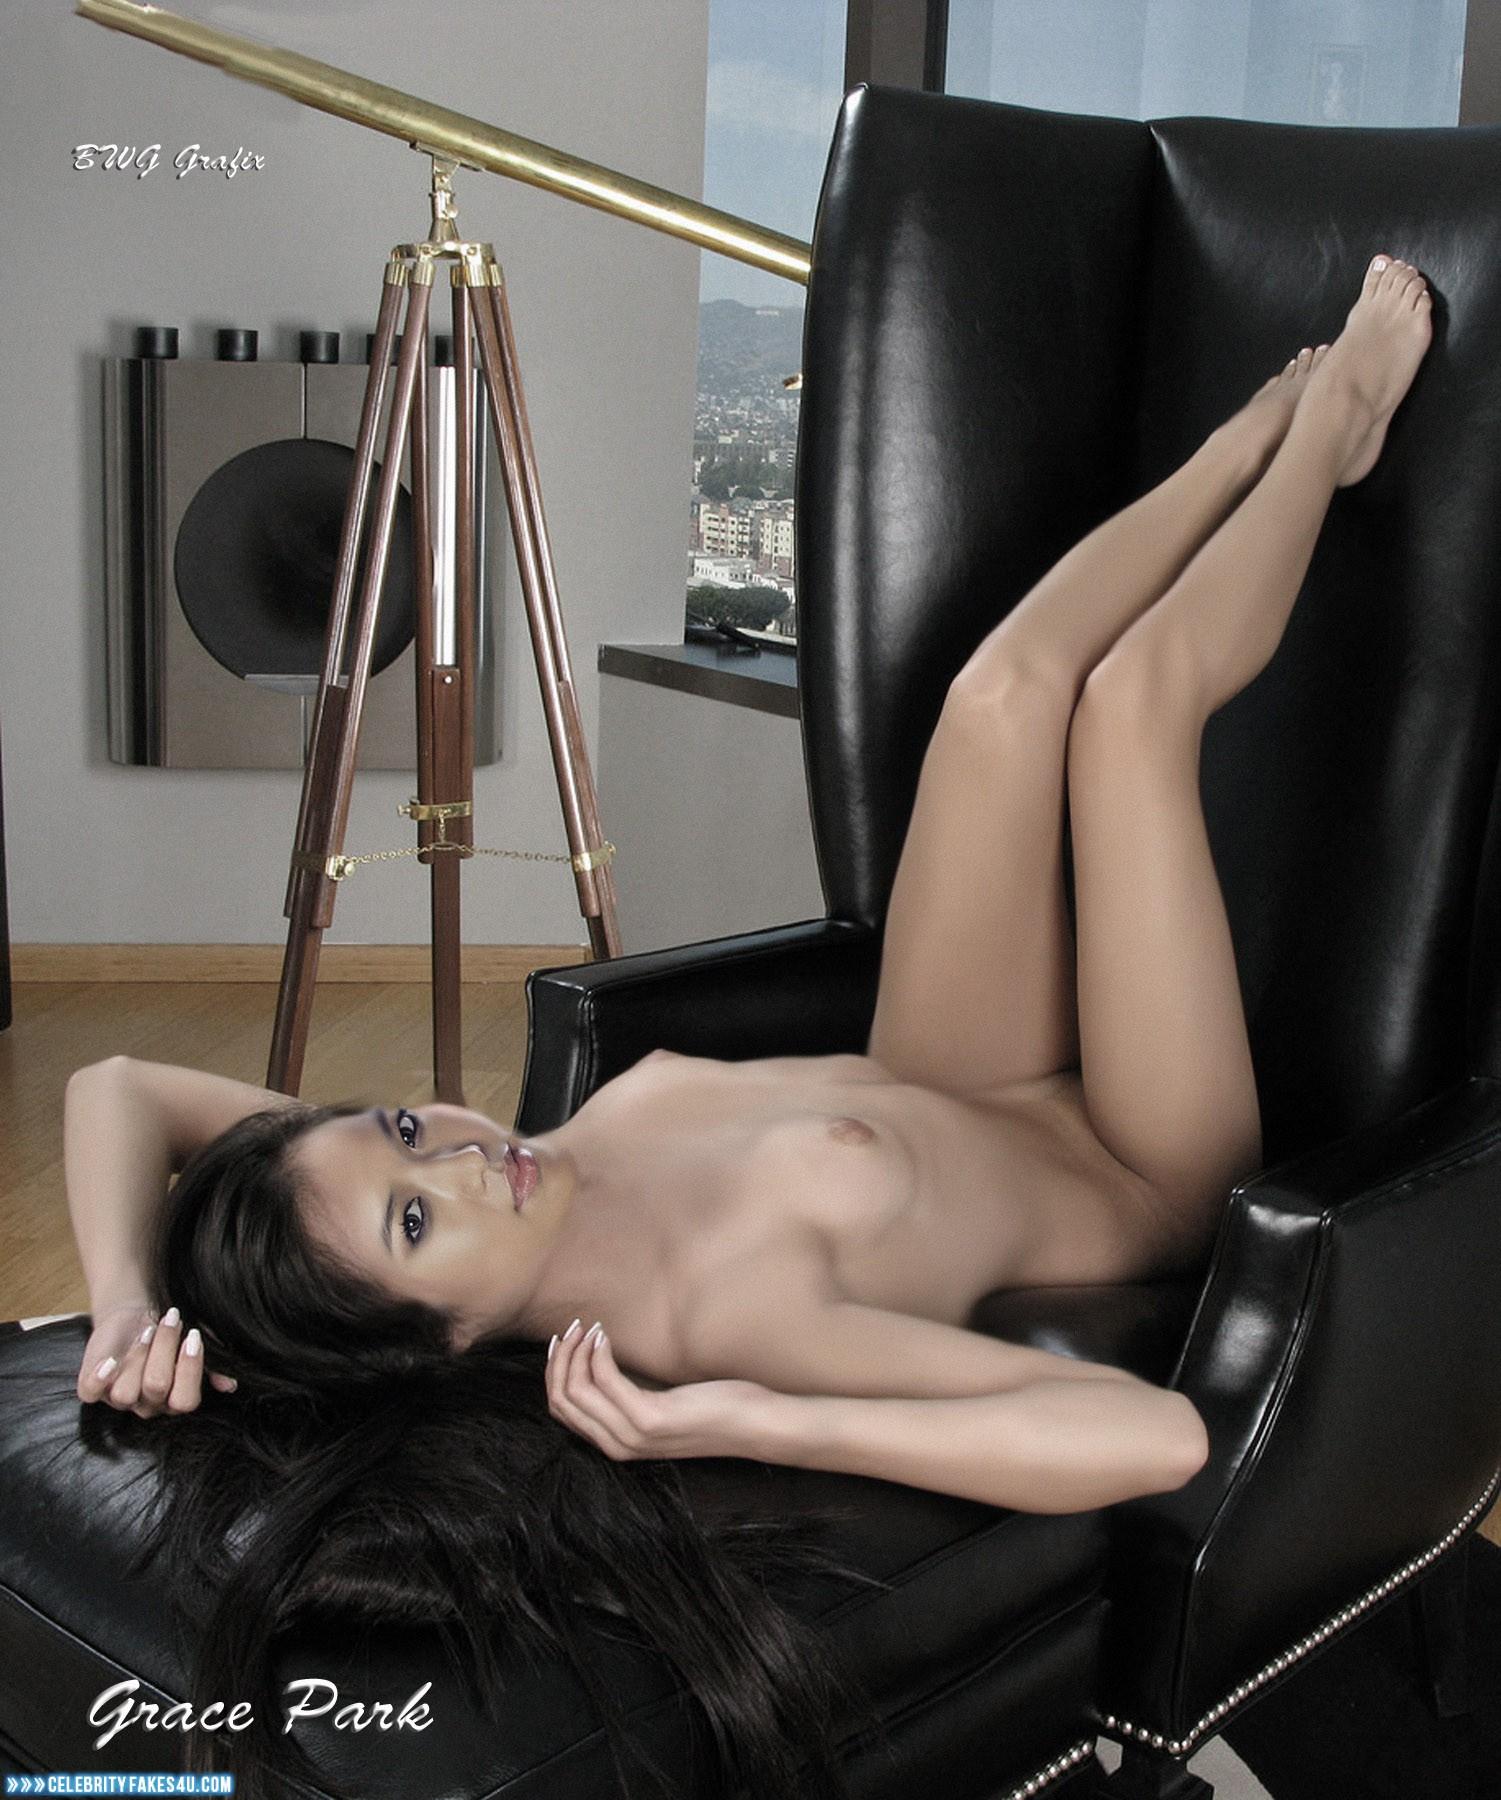 Grace Park Legs Boobs Nude 001  Celebrityfakes4Ucom-2654